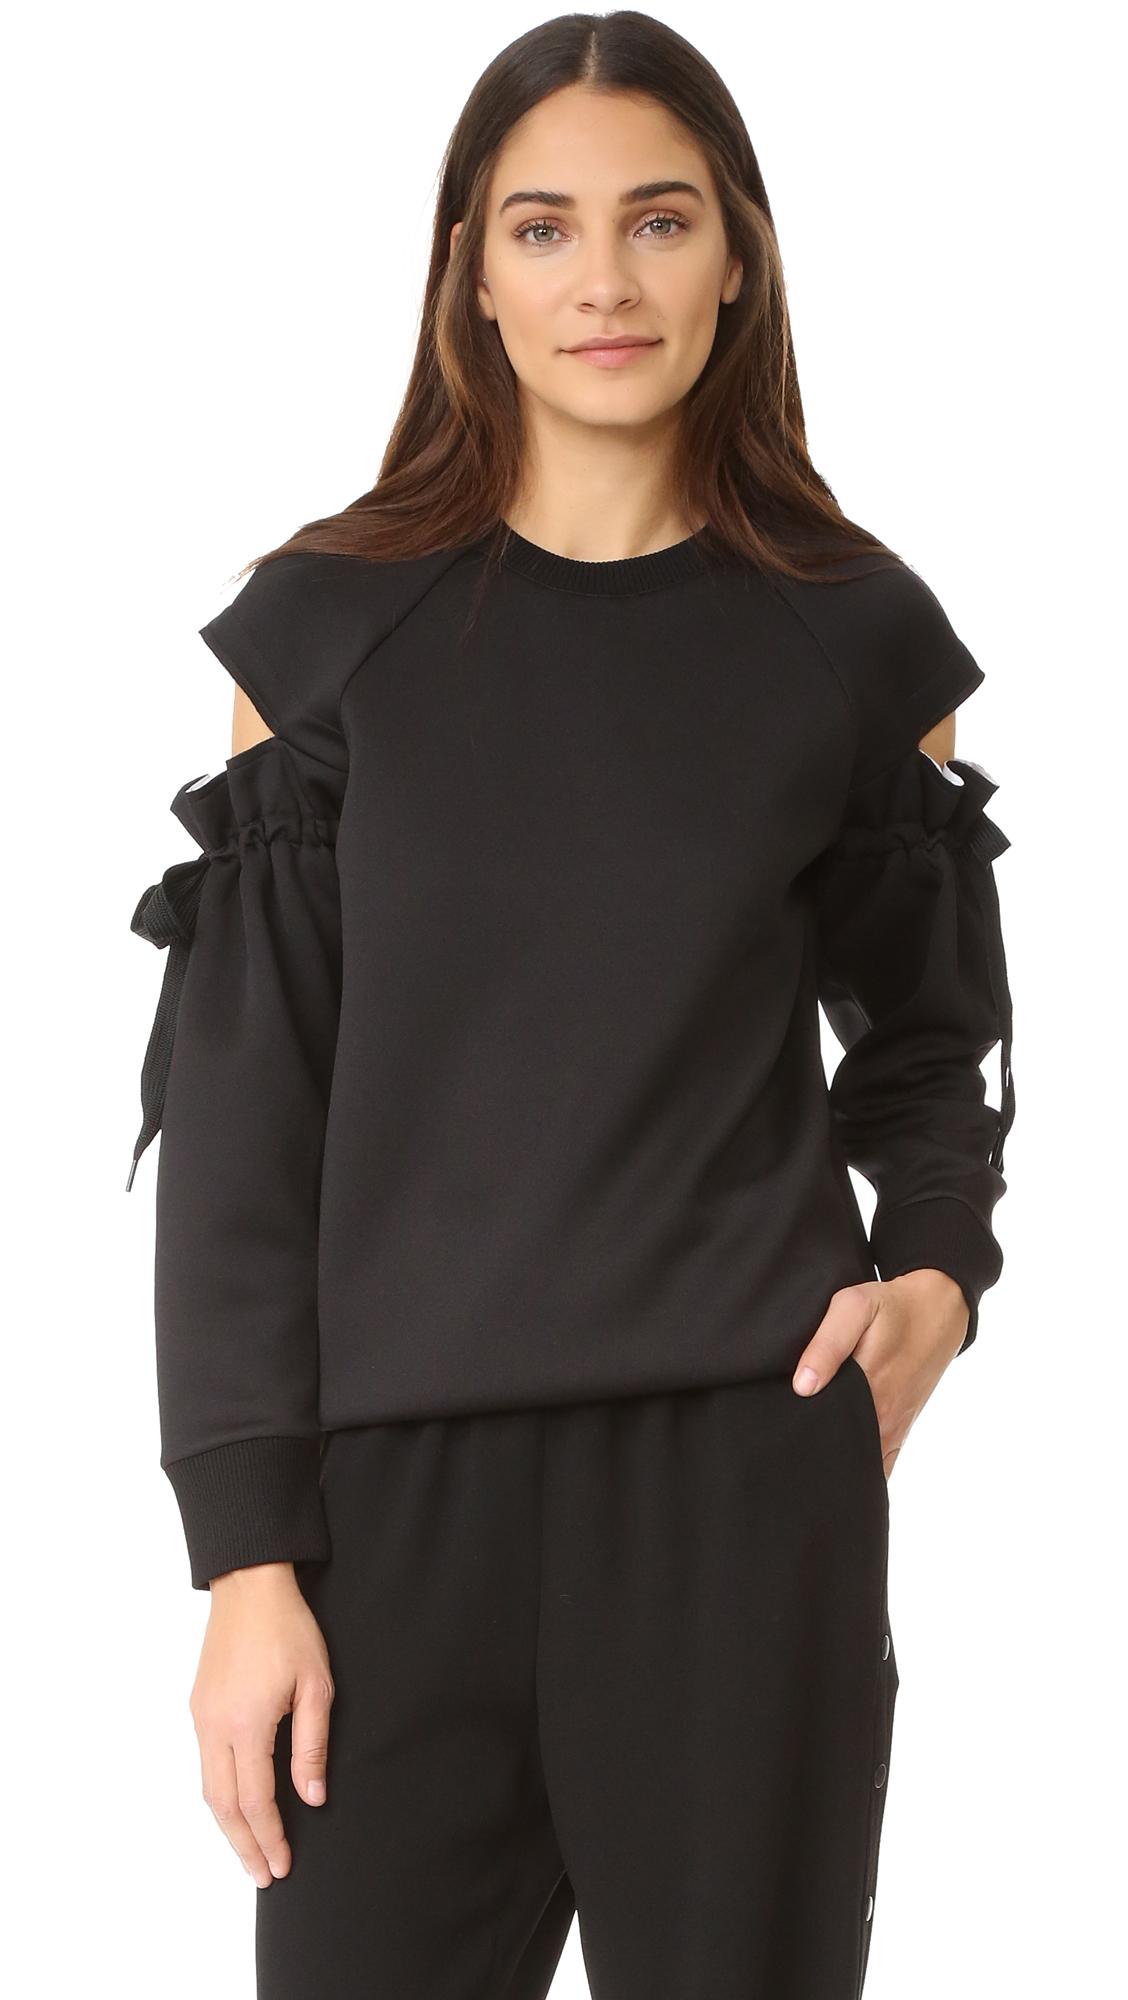 Dkny Top With Drawsting Sleeves - Black at Shopbop